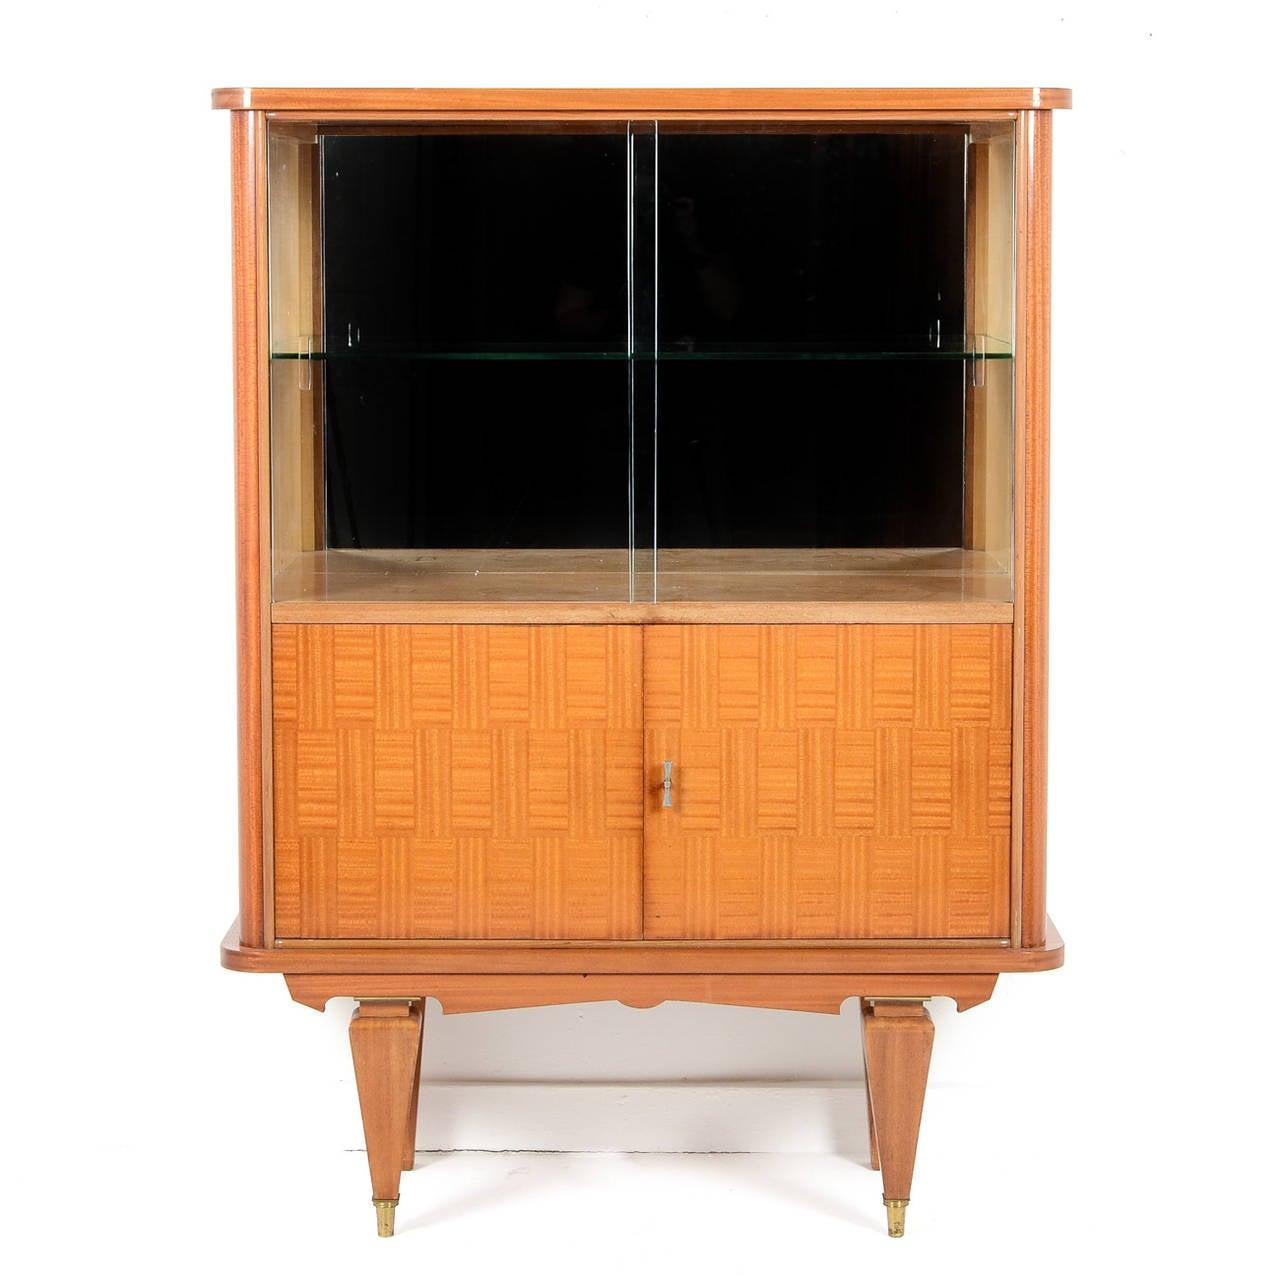 mid century modern bar cabinet from paris circa 1950 at 1stdibs. Black Bedroom Furniture Sets. Home Design Ideas